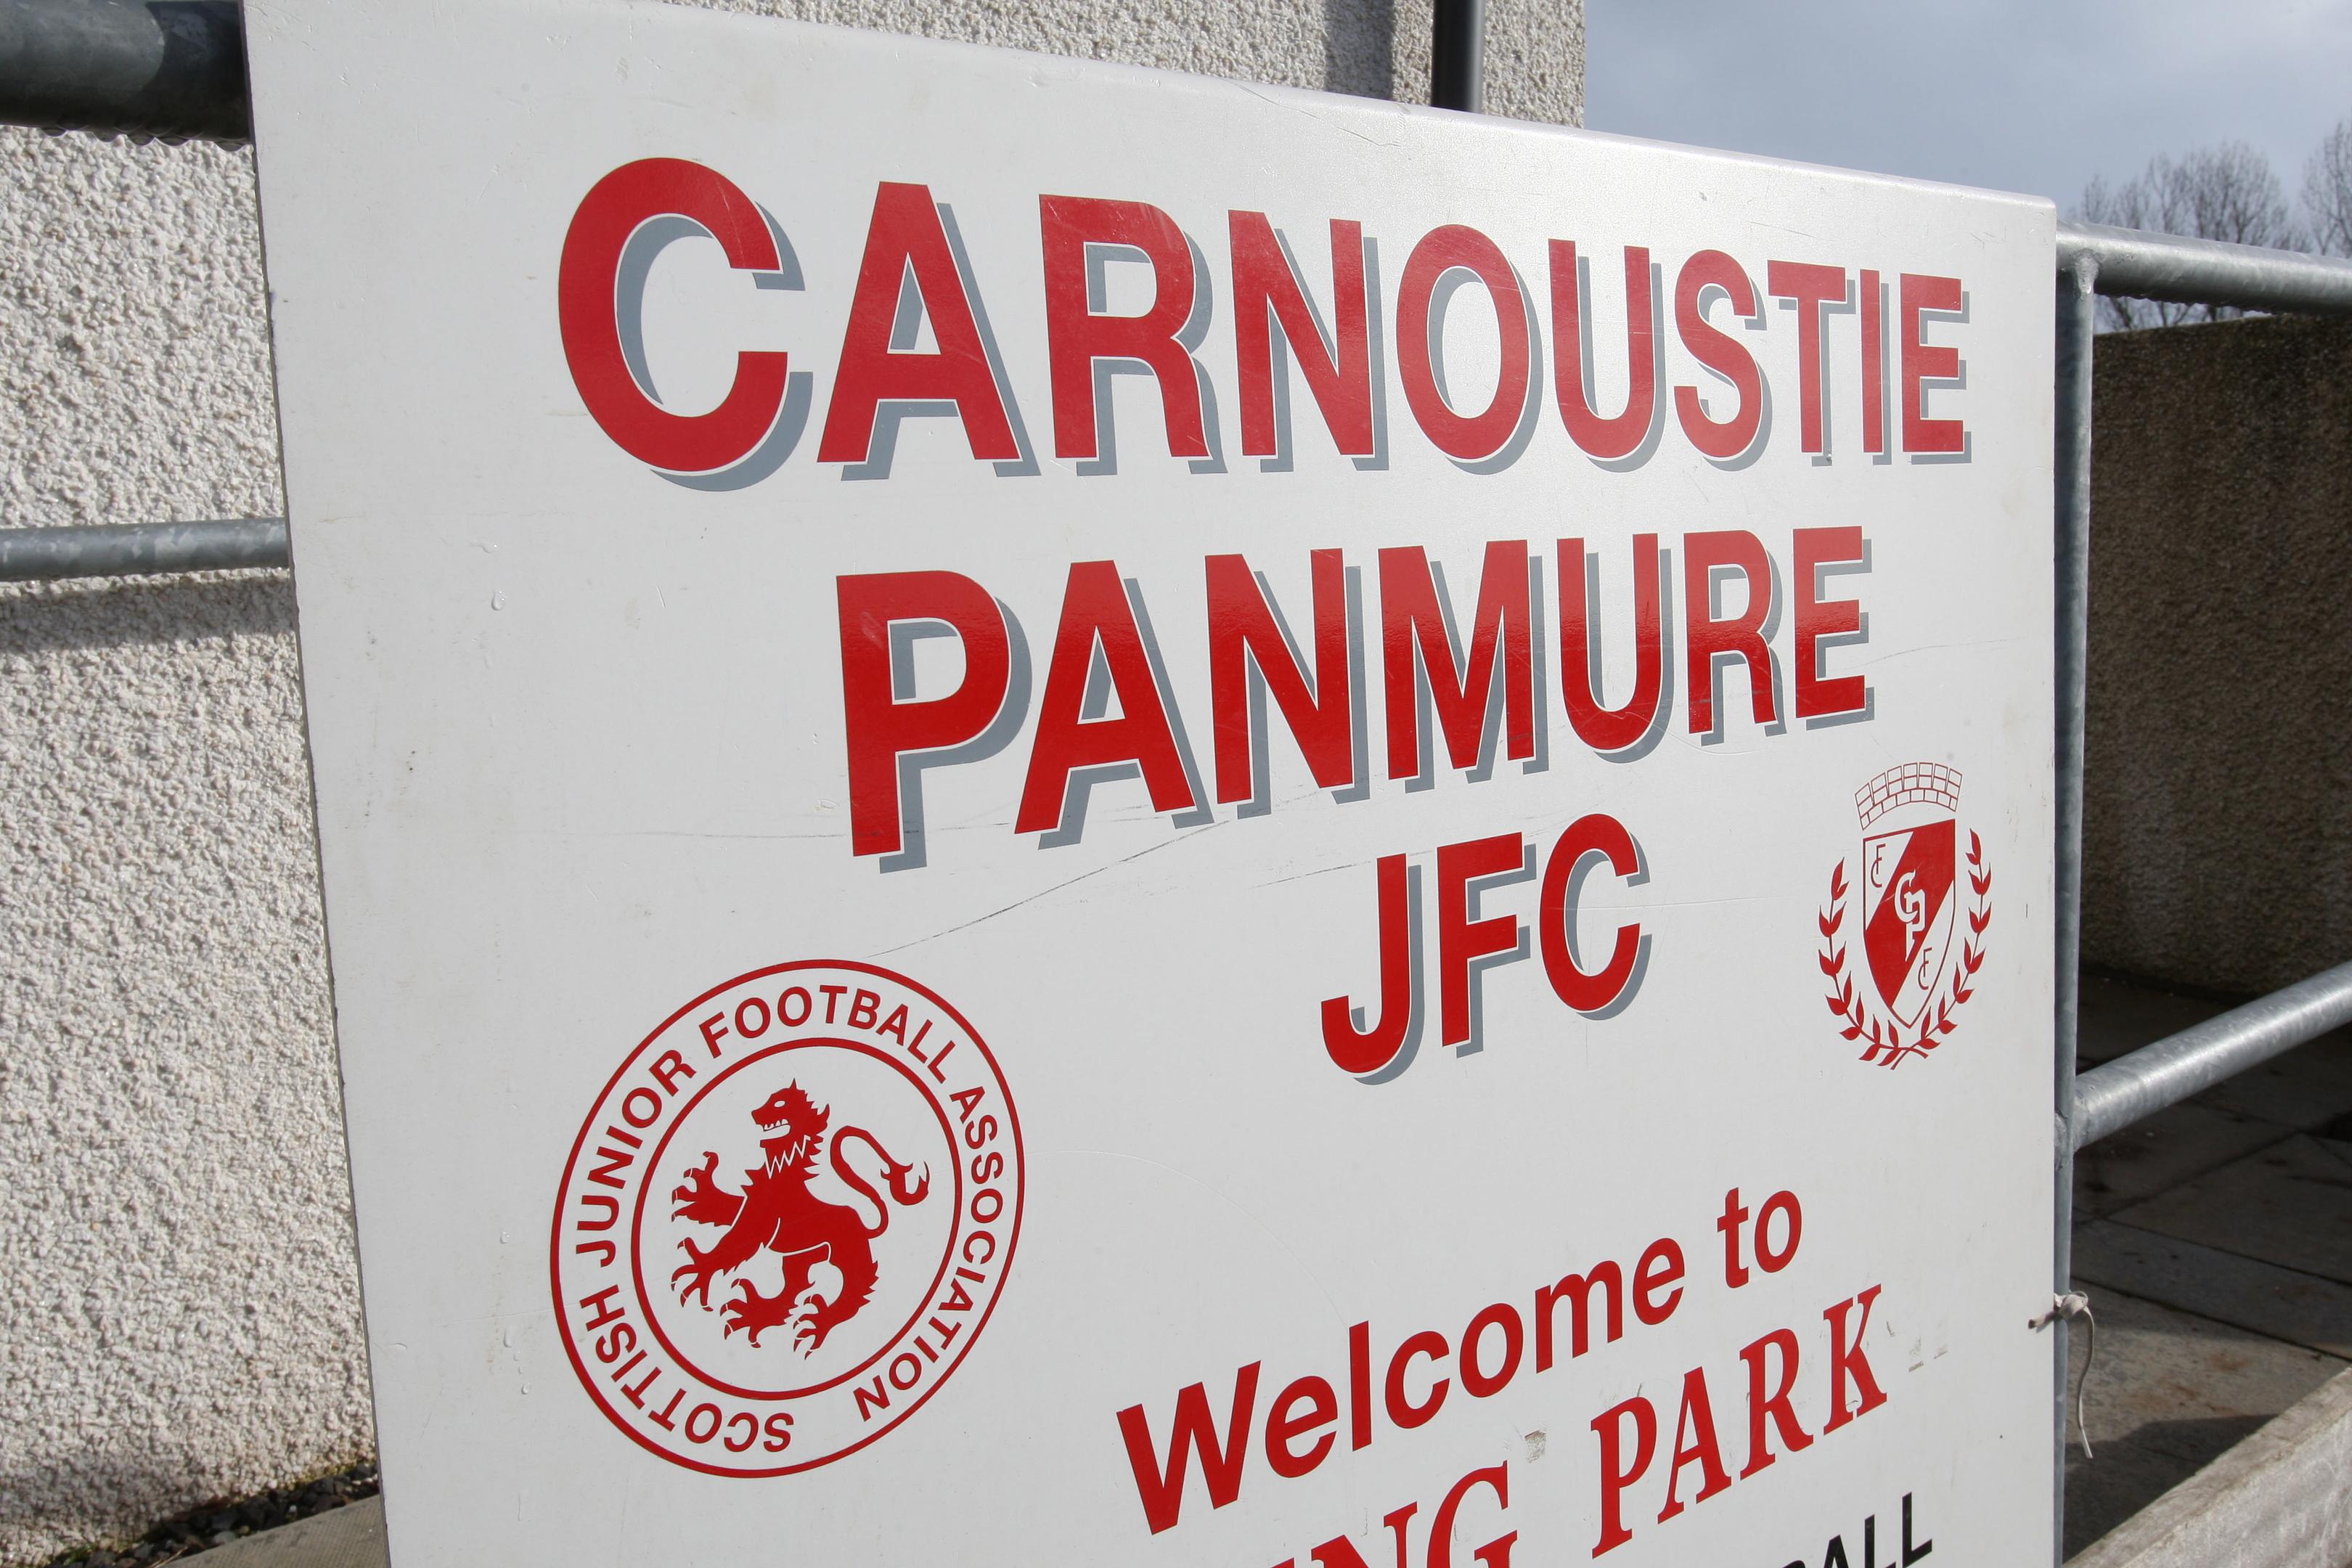 Carnoustie Panmure JFC.